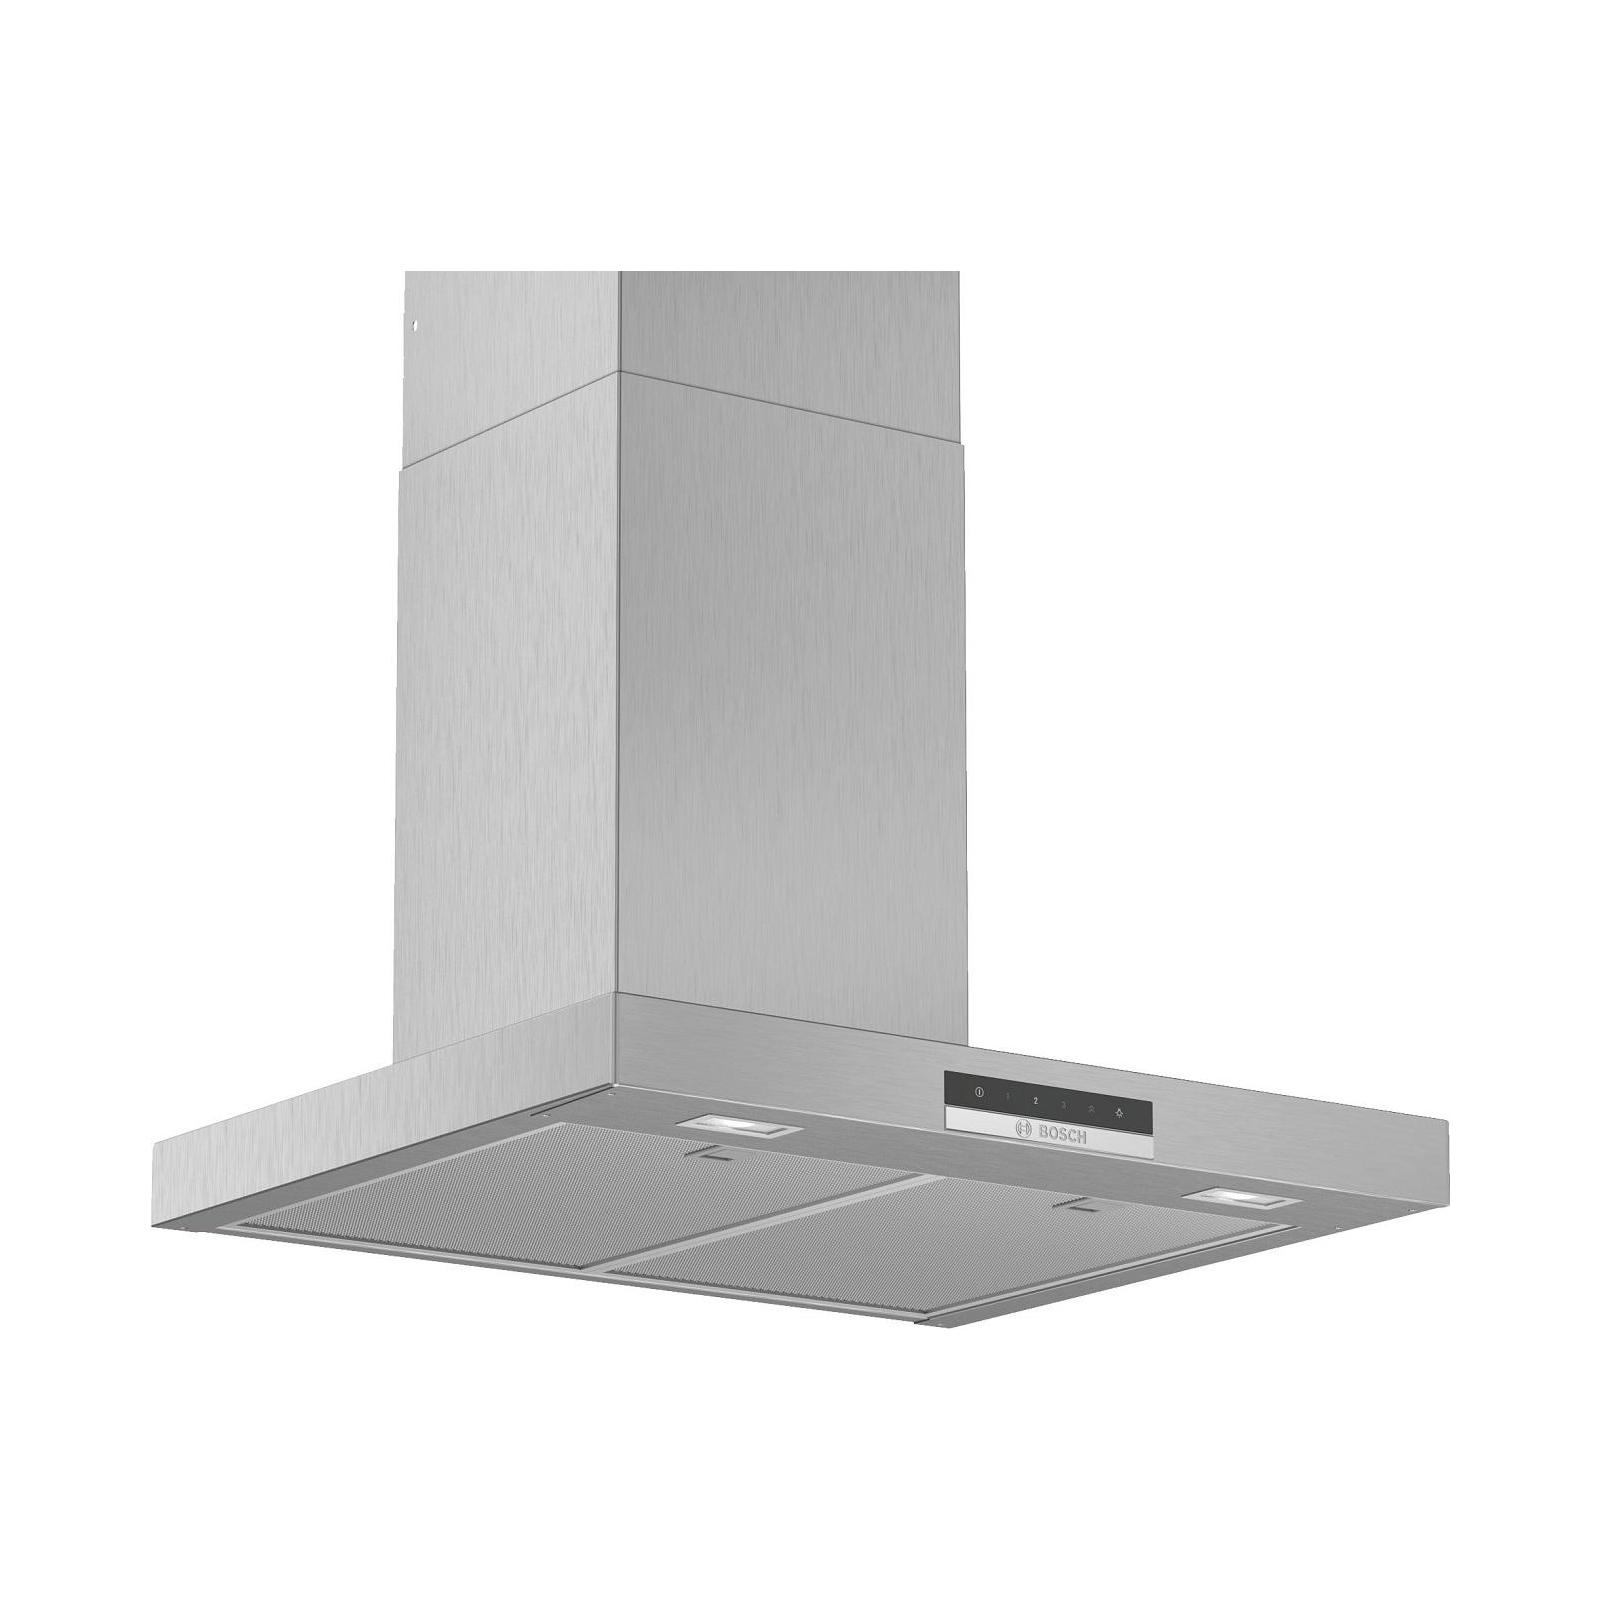 Вытяжка кухонная Bosch DWB66DM50